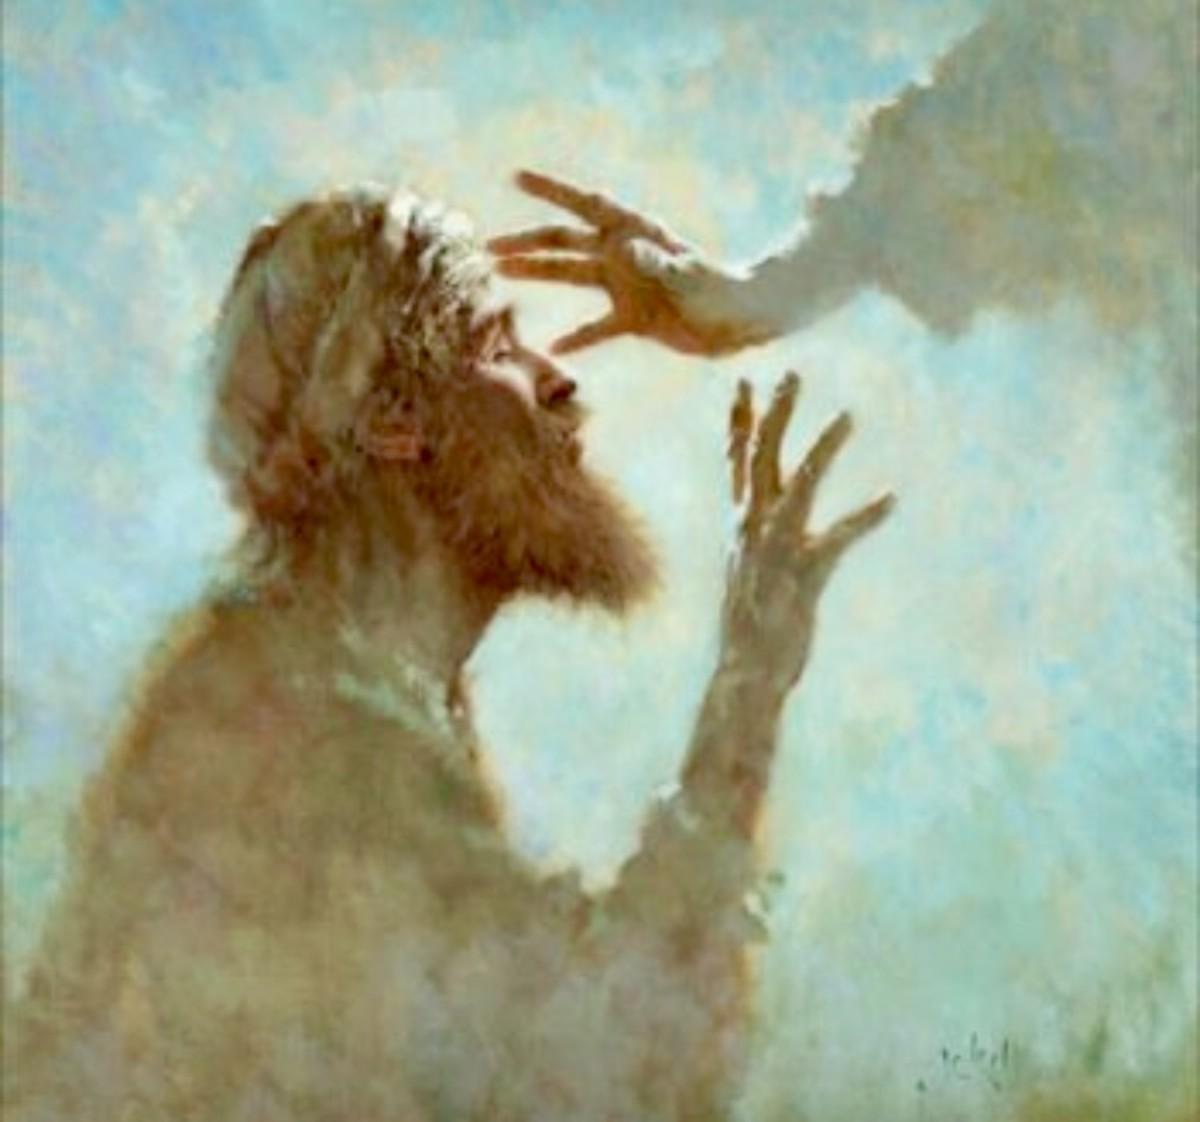 Daily Mass Reflections - 11/19